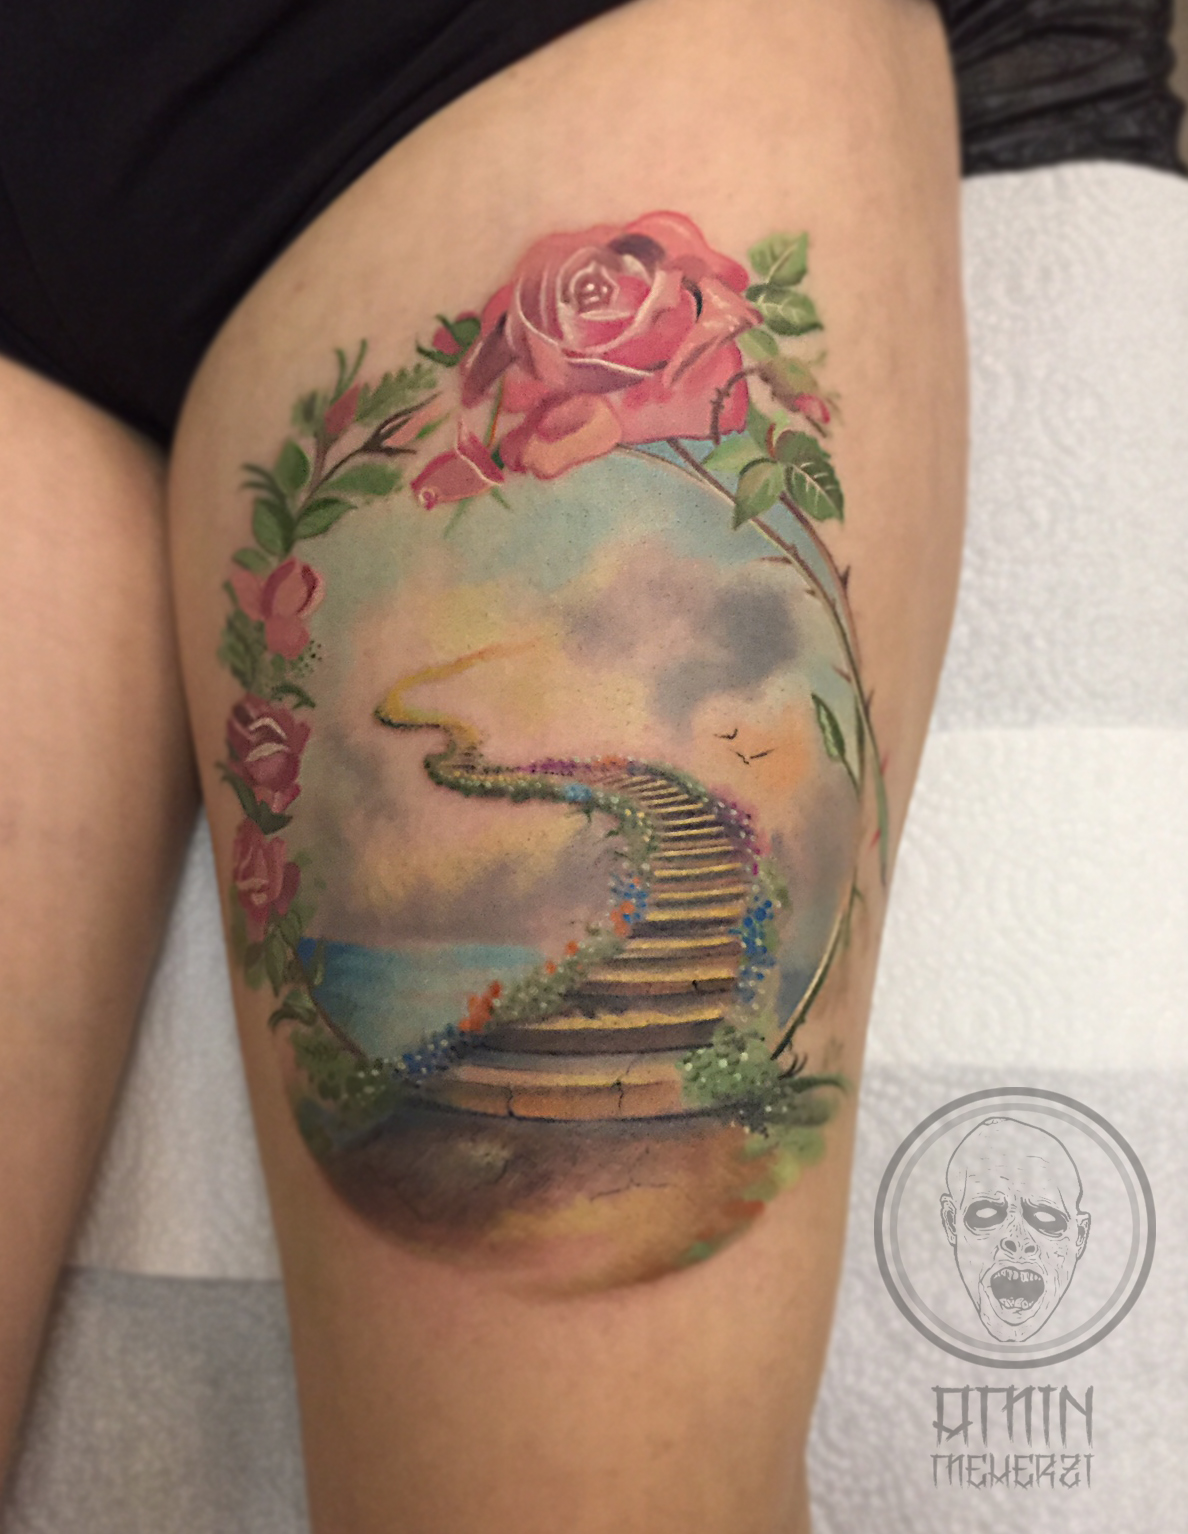 oups magnum wien vienna  Tattoolife Tattoowork Tattoo Ink Worldofink Inkmaster Tattoogirl Tattooidea Tattoos Tattooworks Viennatattoo Tattoomagazine Tattooconvention Inkwork Realisictattoo Realisticink Tattooshop Blackandgrey Blackandgraytattoo Skin Skinartmag tattoorevuemag supportgoodtattooing sharonalday tattoocommunity tattooedlife tattooed inkedup tattooculture artwork tattooscout tattoodo tattoodobabes myworldofink  tattu tatu opusmagnumtattoo killerink besttattoo besttattooing bestoftattooink tattooing mastertattoo mastertattooing mastertatu mastertattooer tattooer besttattooever bestinktattoo besttattooartist  tattooartist reasliticartist realistictattooartist tattooingartist  inkartist awsometattoo awsomtattooartist awsomtattooartists awsomtattooing awsomink awsomtattoorealistic awsomtattoohyperrealistic nicetattoo nicetattooart nicetattoowork nicetattooink nicetattooart famoustattoo famoustattooart famousartwork famostattooartist goodtattooing goodtattoos goodtattoorealistic tattooconvention inportainttattoo importainttattooart importainttattoowork importaintartist importantrealistictattoo importainttattooing tattoogun amintattoo aminart aminmeherzitattoo amintattooartist amin aminartist meherzitattoo aminmeherzi 1150wien schweglerstaße skintattoo tattoooftheday tattoooftheweek tattooofthejear tattooprice tattooinfinity tattoos tattooblack tattooapointment tattooaustria usatattoo lining liningtattoo insta instagram facebook fb projecttattoo project love fun progressing progress artofopusmagnum artofopus artofmagnum sullen sullentattoo sullenart sullenink worldfamousink killerinktattoo killerink killerinkamin shading shadingtattoo  sullen sullenfamily girlswithtattoo boyswithtattoo inkedman inkedboy inkedgirl design style tattoostyle lovemyjob lovetattoos wowtattoo realism realismtattoo realismtattooart silverbackink silverbacktattoo silverback tattooartgallarie gallerie galleri pritty prittytattoo prittytattooidea prittytattooing freshlyink freshlyinked ta